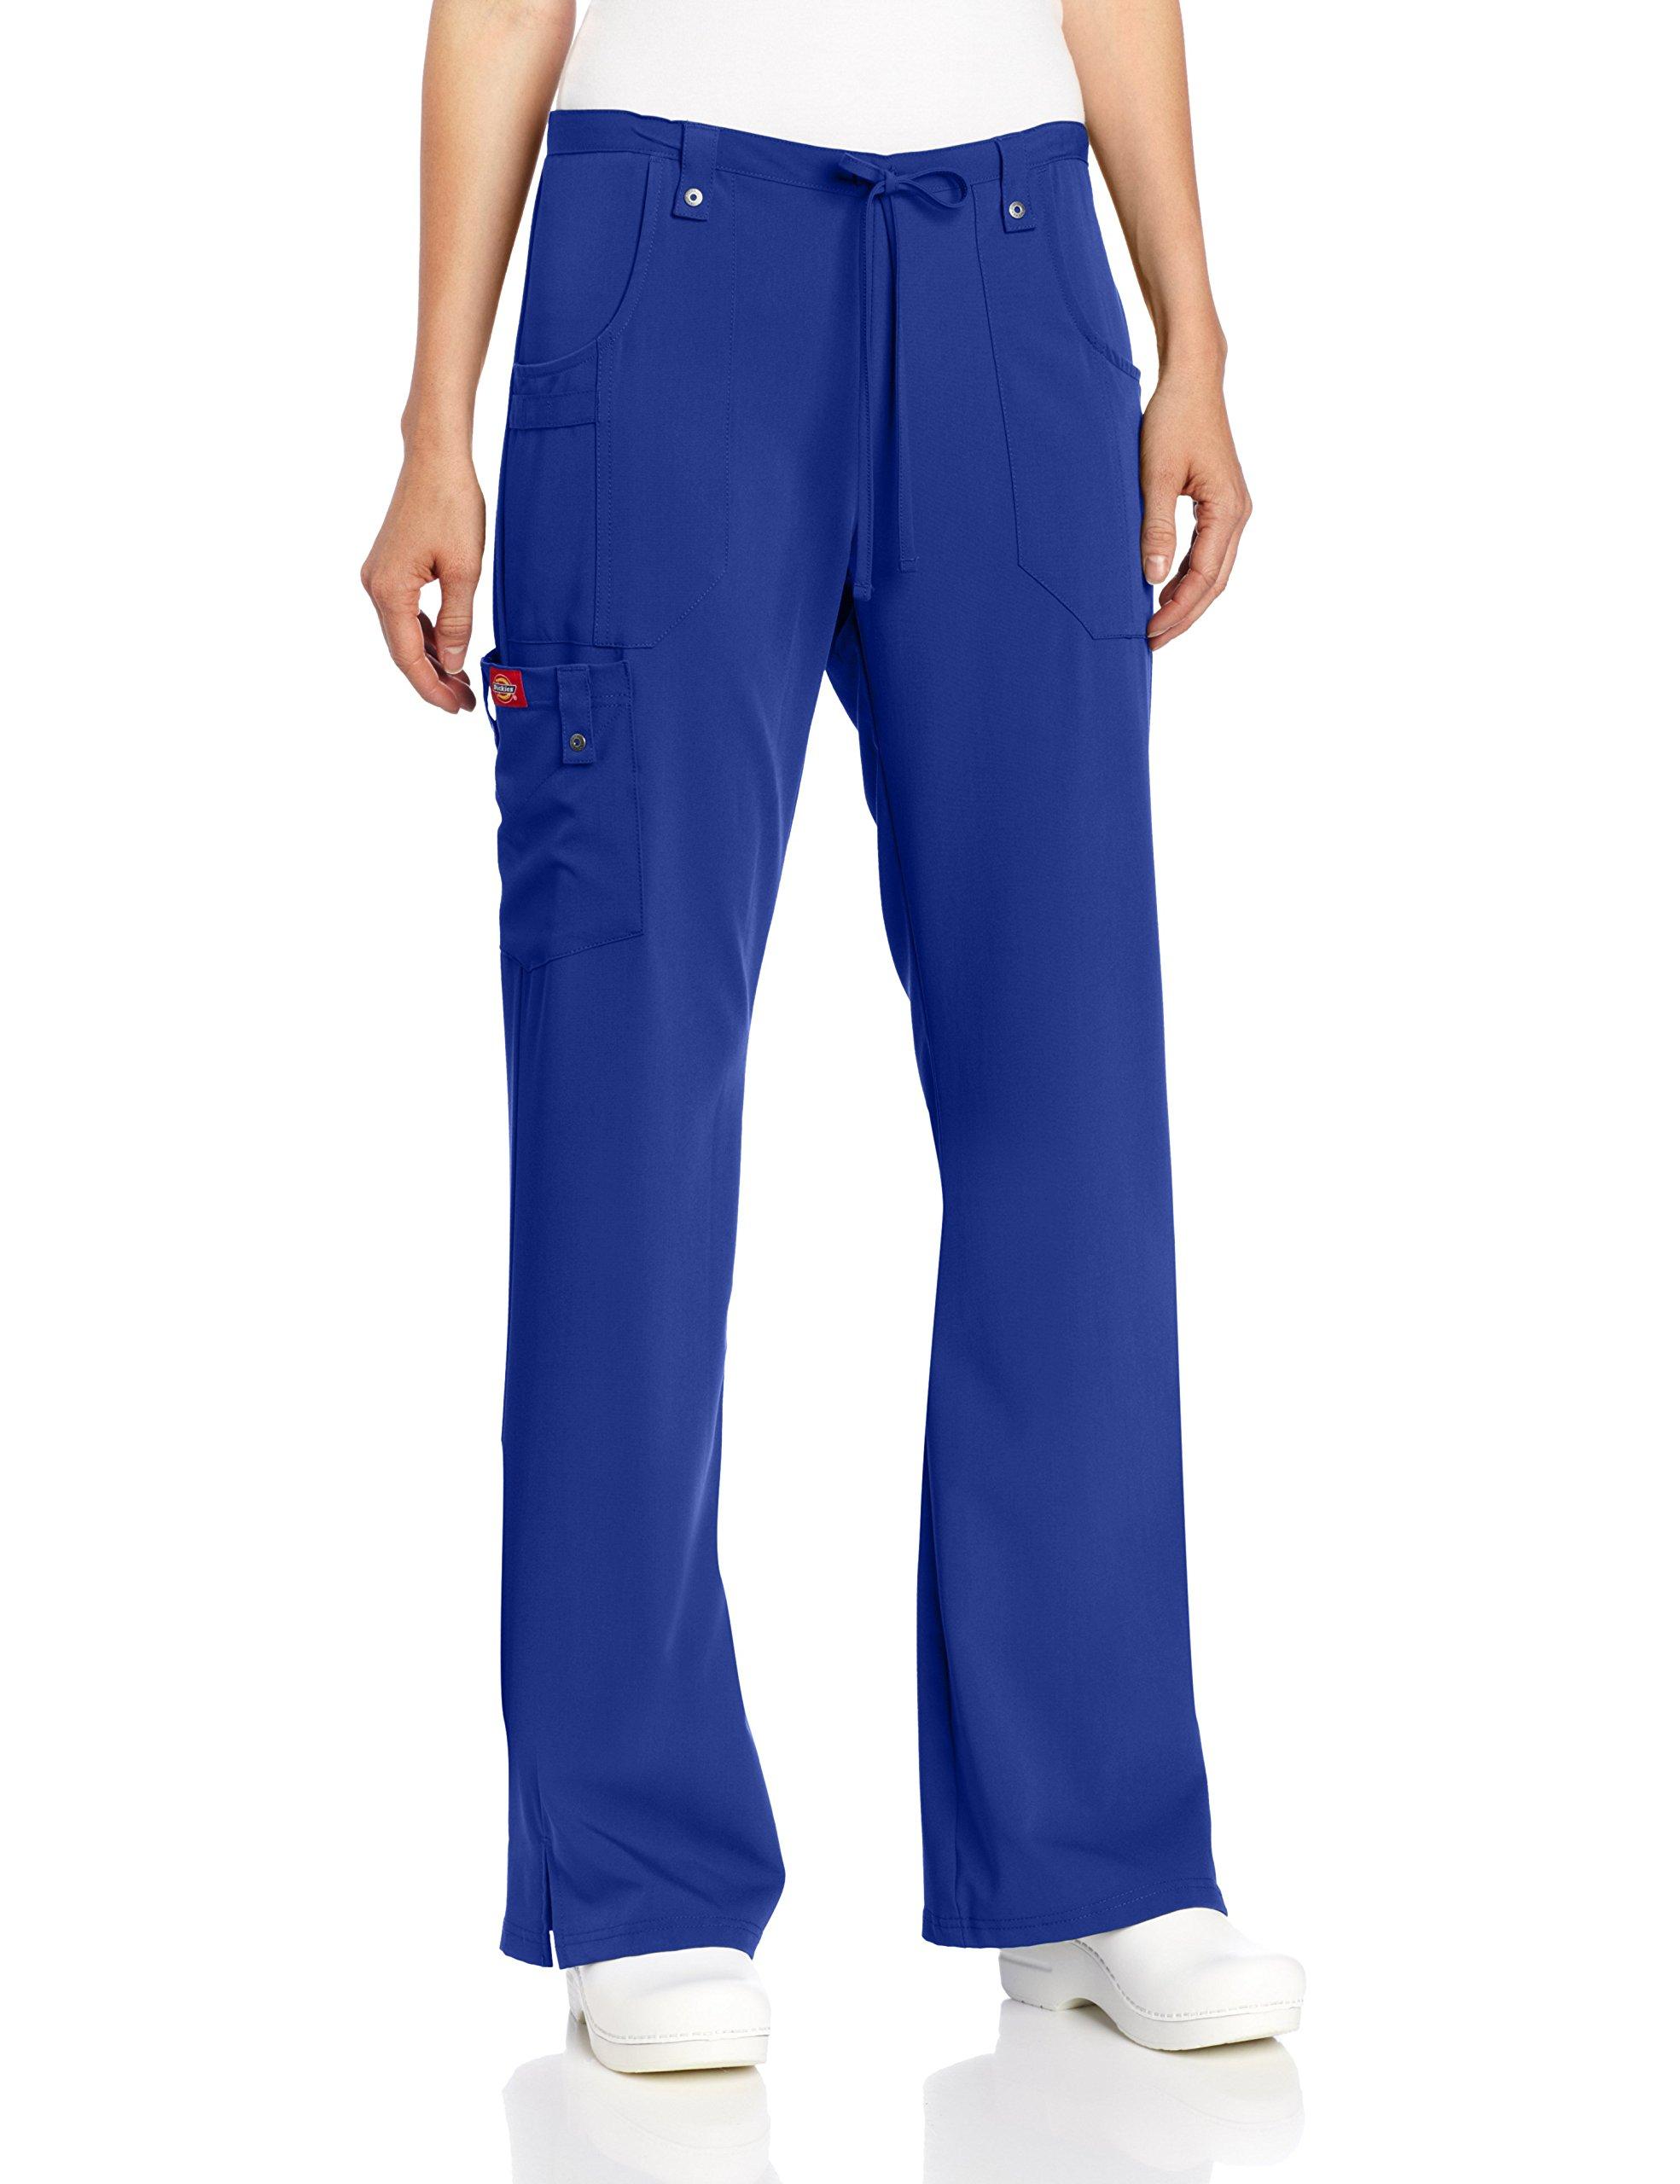 Dickies Women's Xtreme Stretch Fit Drawstring Flare Leg Pant, Galaxy Blue, X-Small/Tall